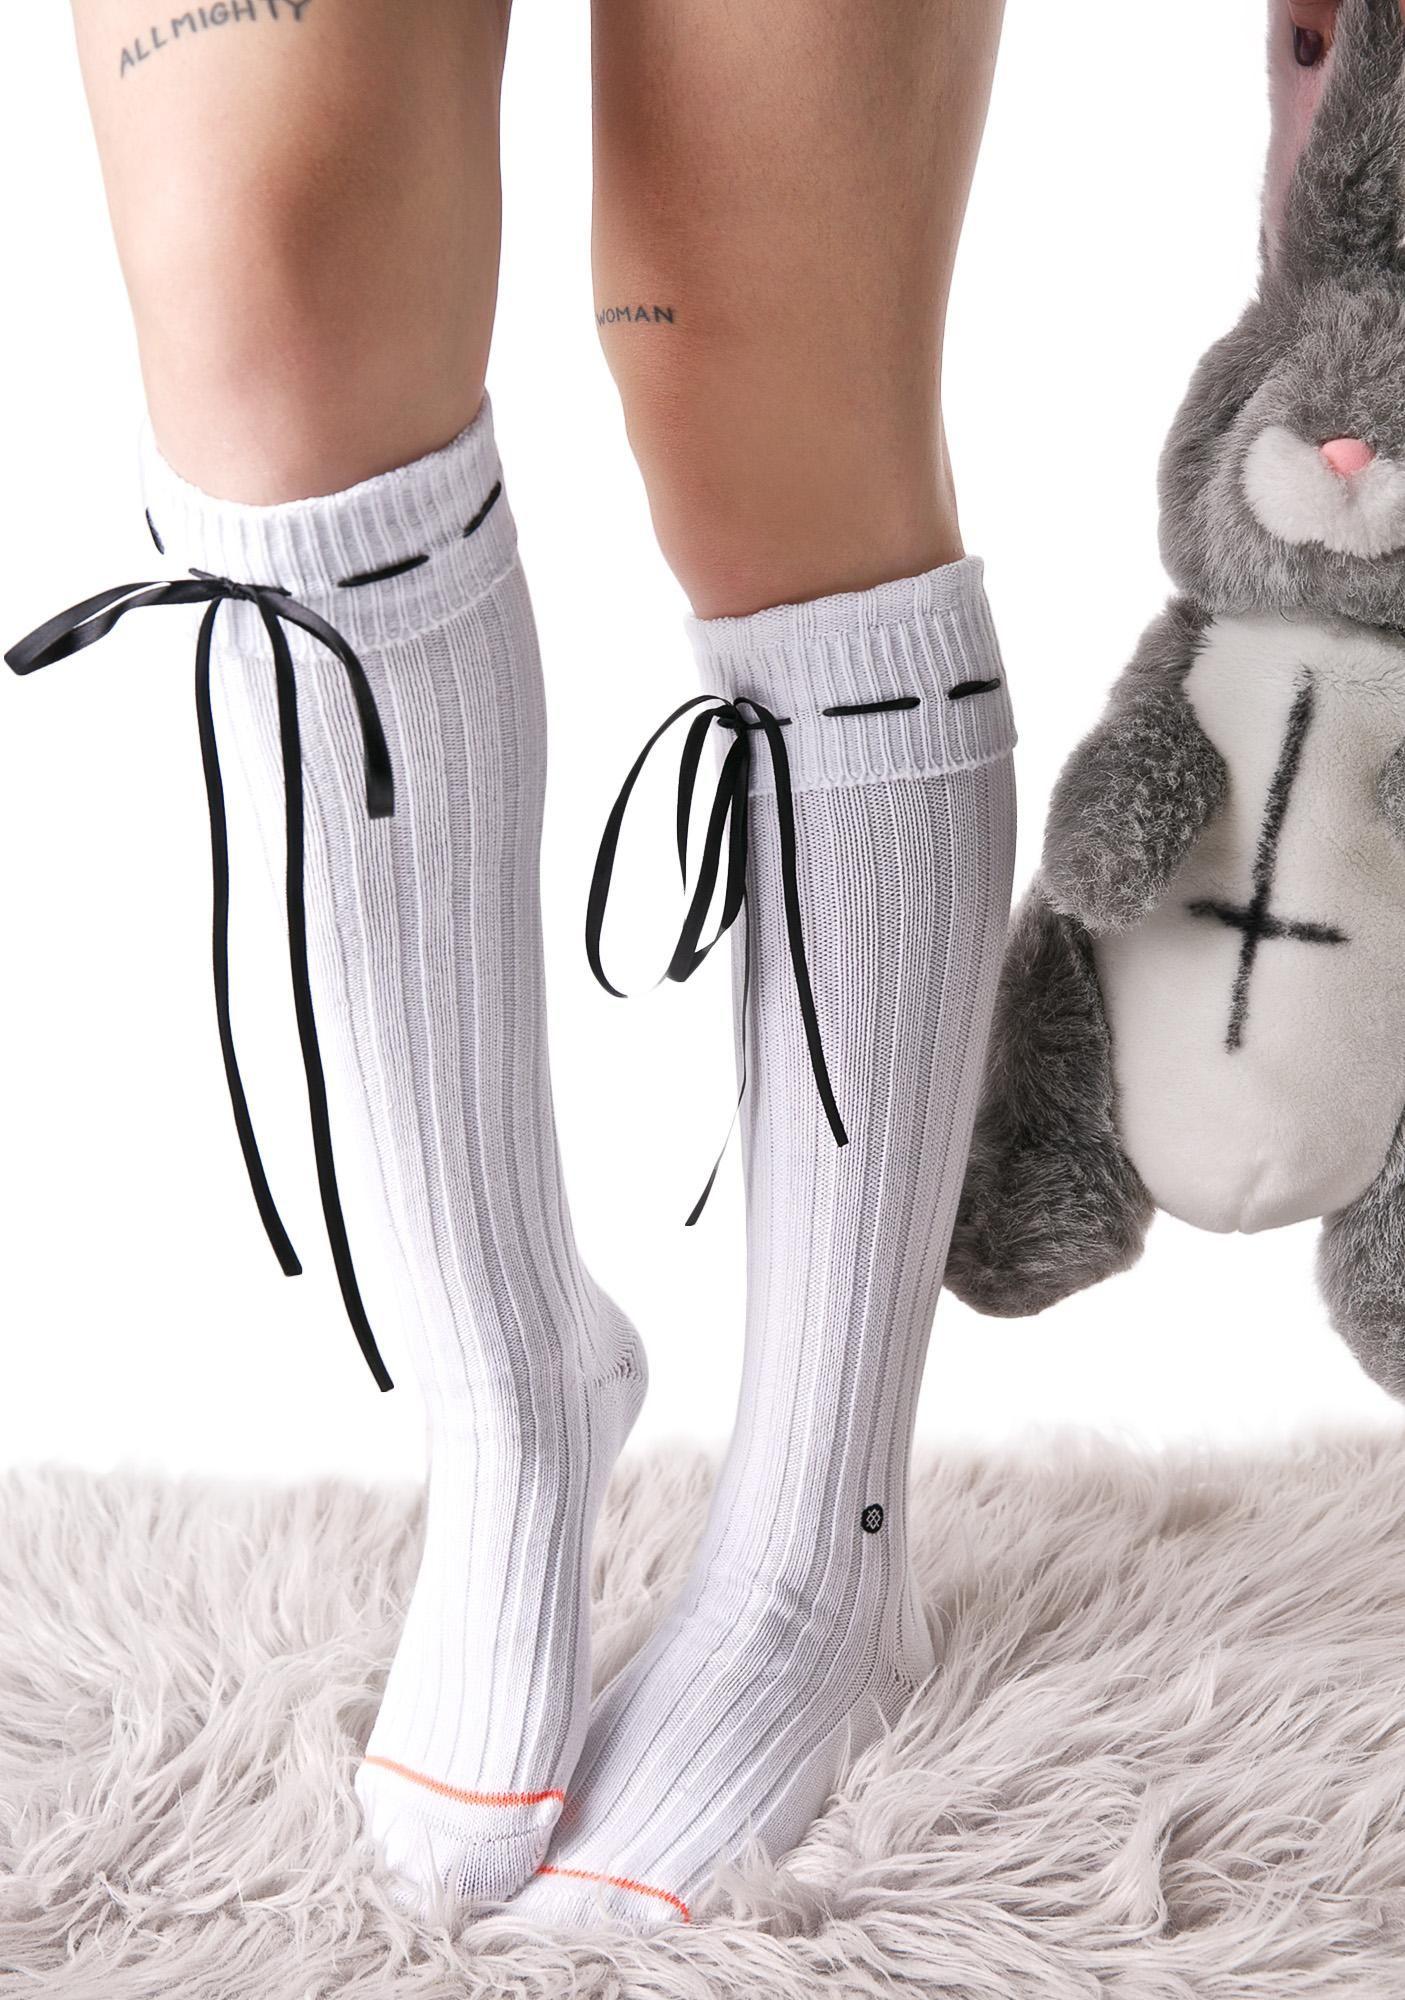 da1626984 Stance Dolores Knee High Socks are gunna wrap ya up perfectly